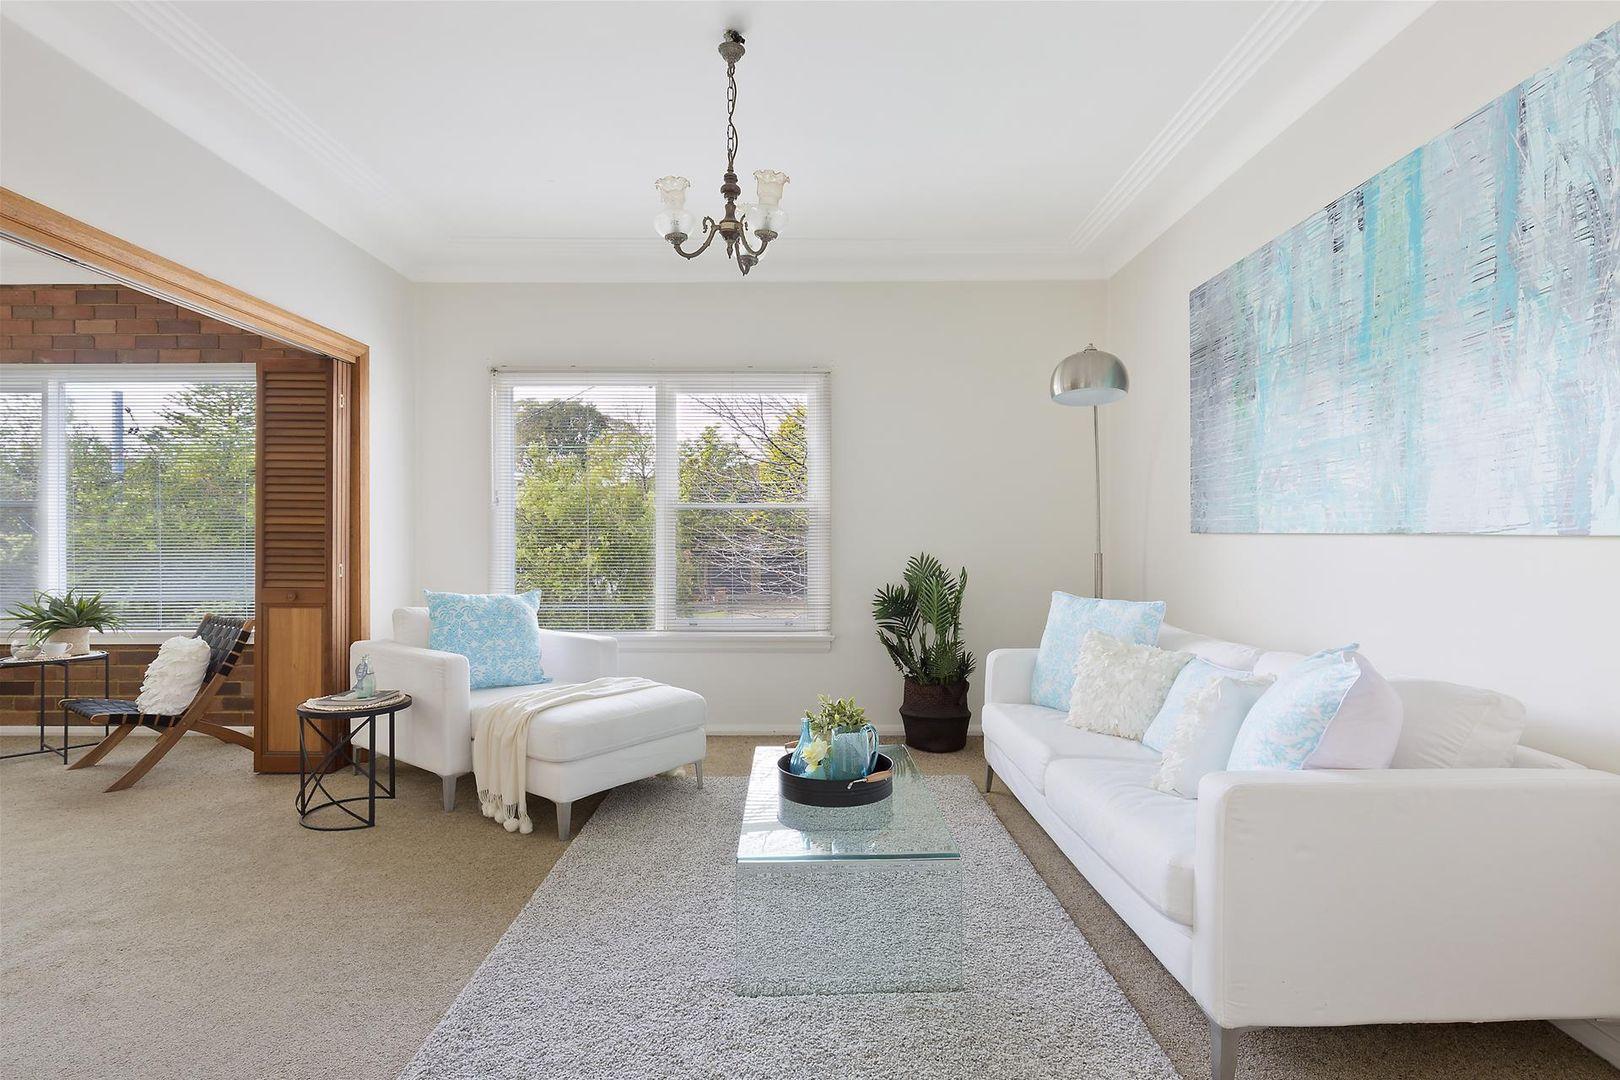 80 Blandford Street, Collaroy Plateau NSW 2097, Image 1